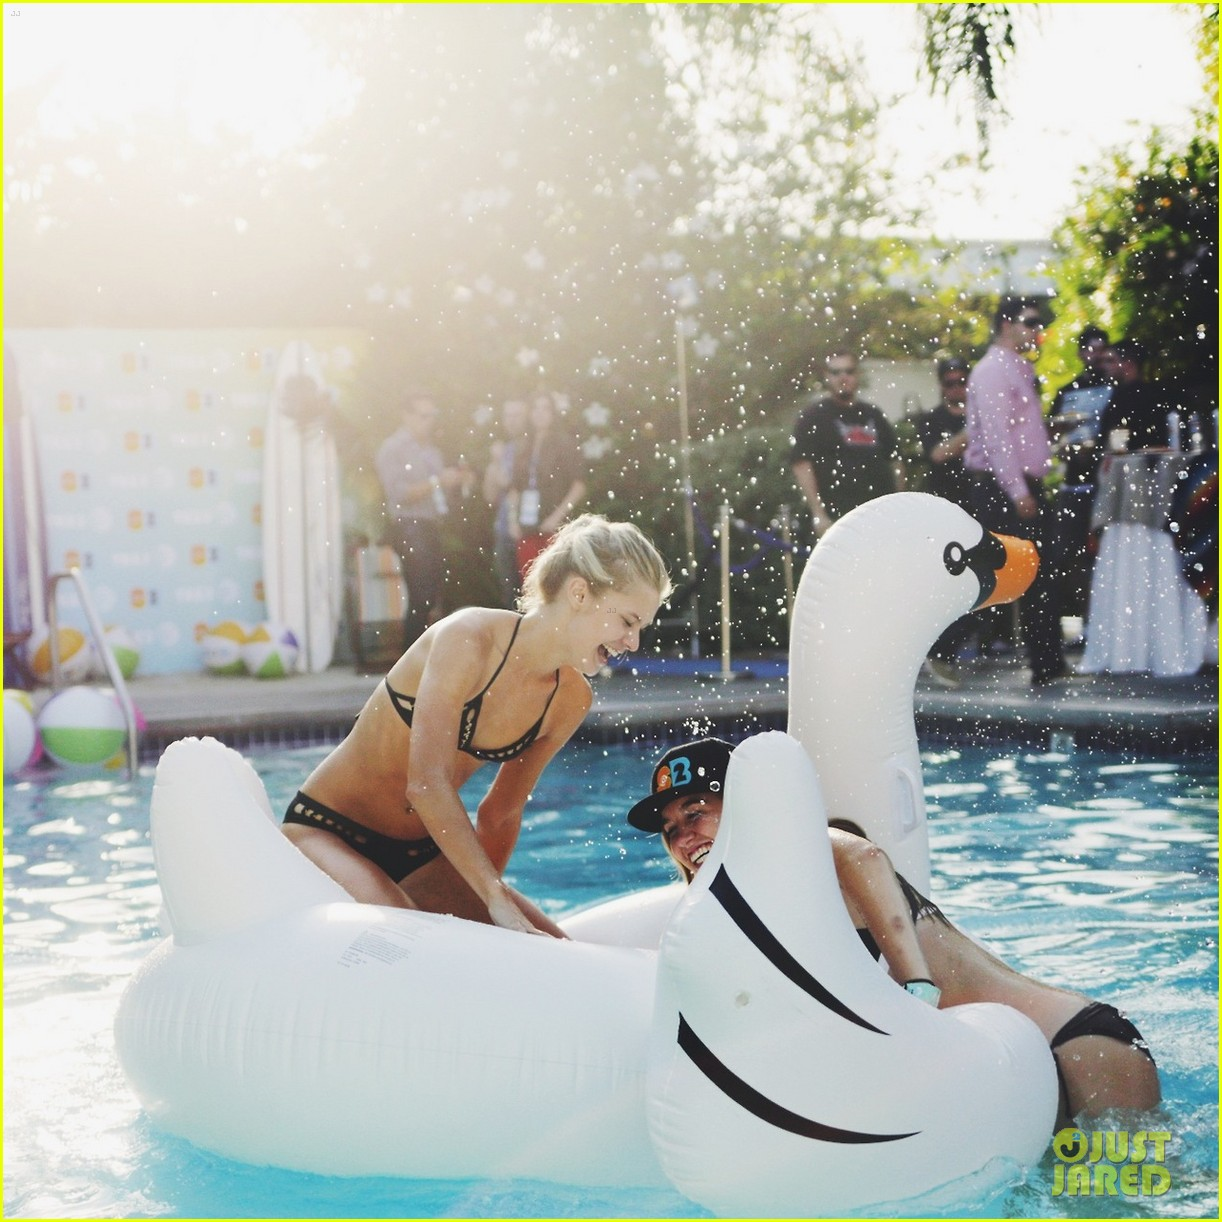 summer break 2 final episode 323178666